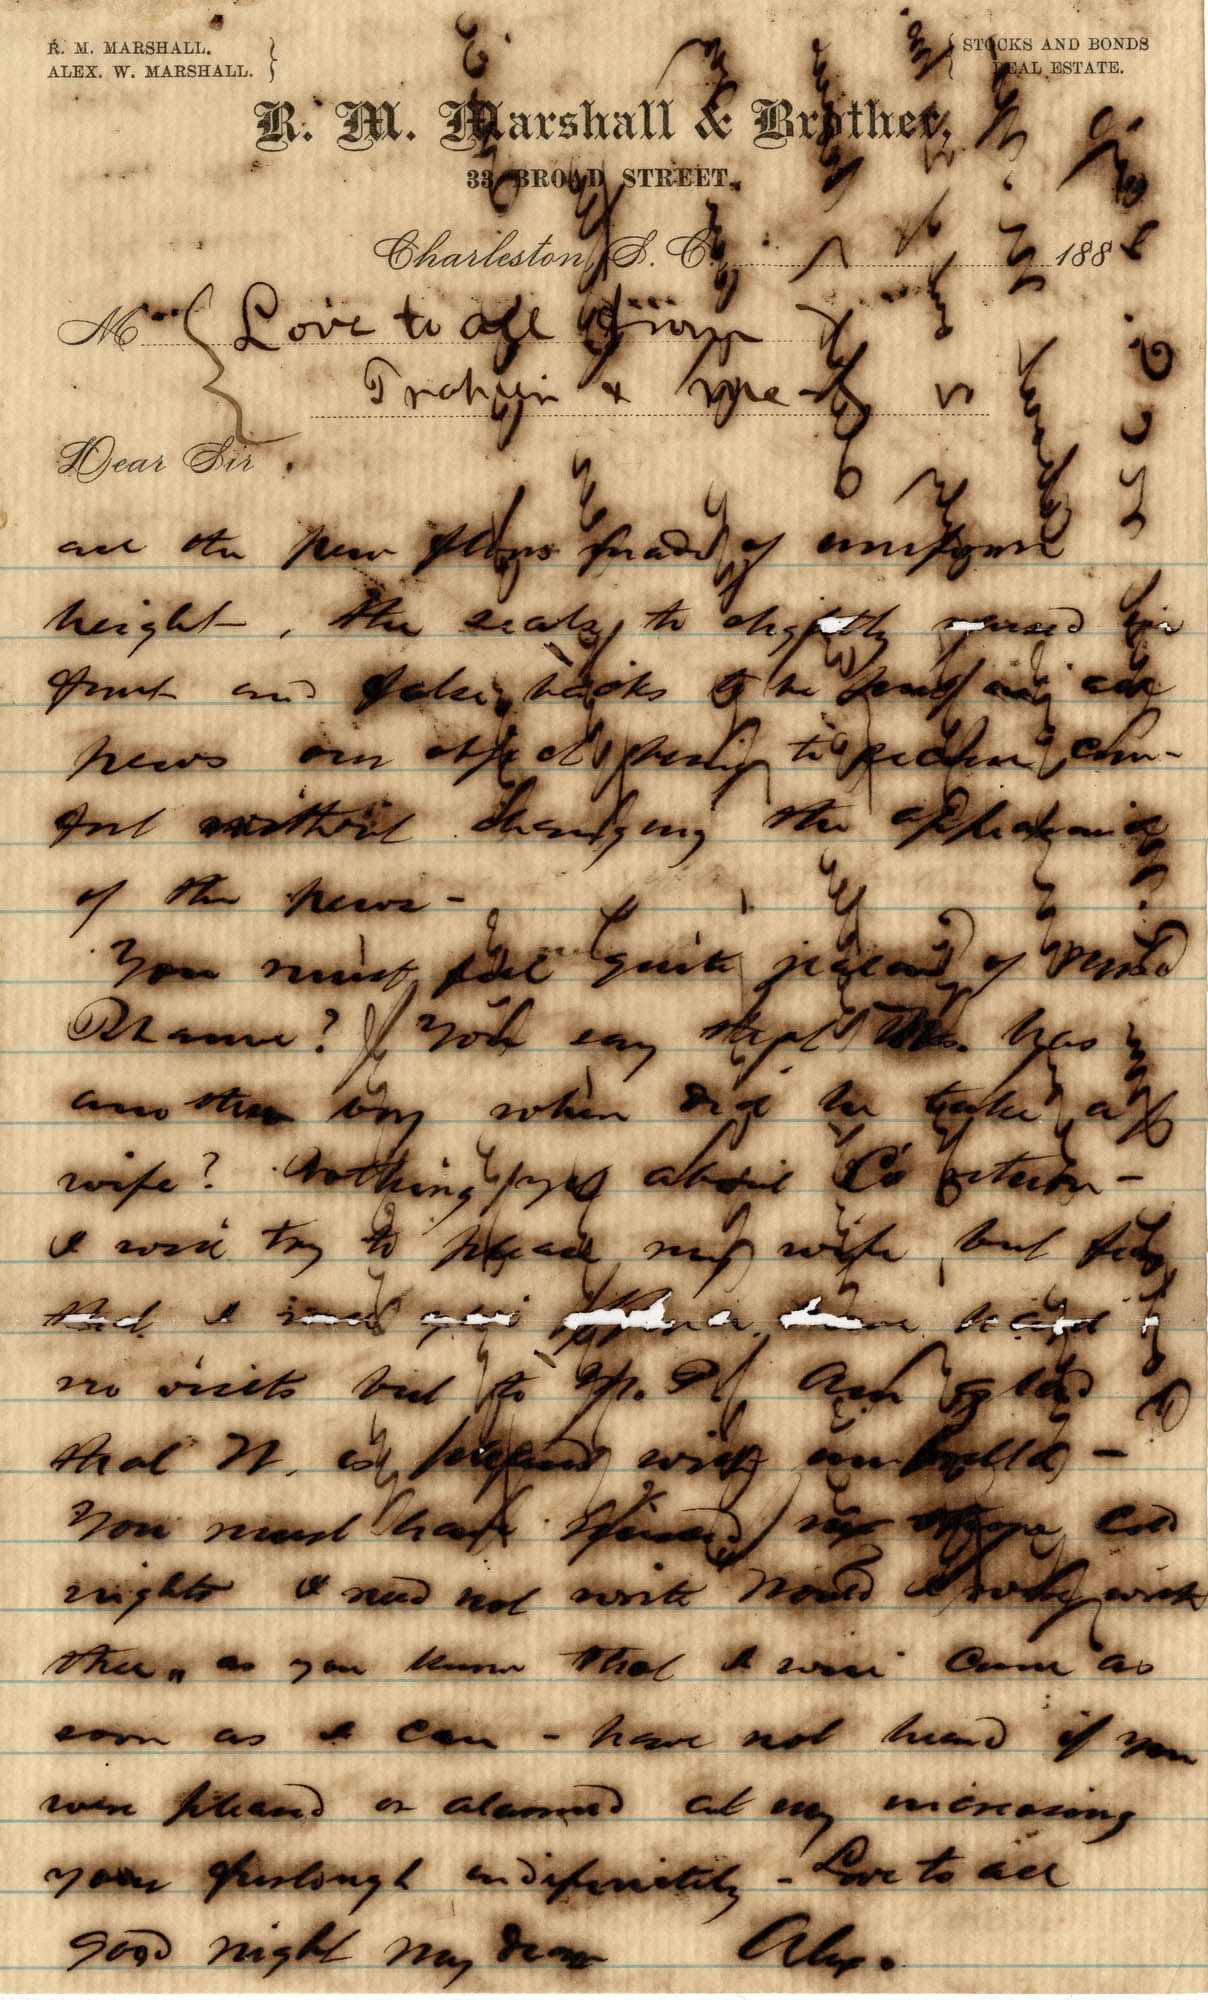 152. Alex Marshall to Magdalen Elizabeth Wilkinson Marshall? -- c.1886